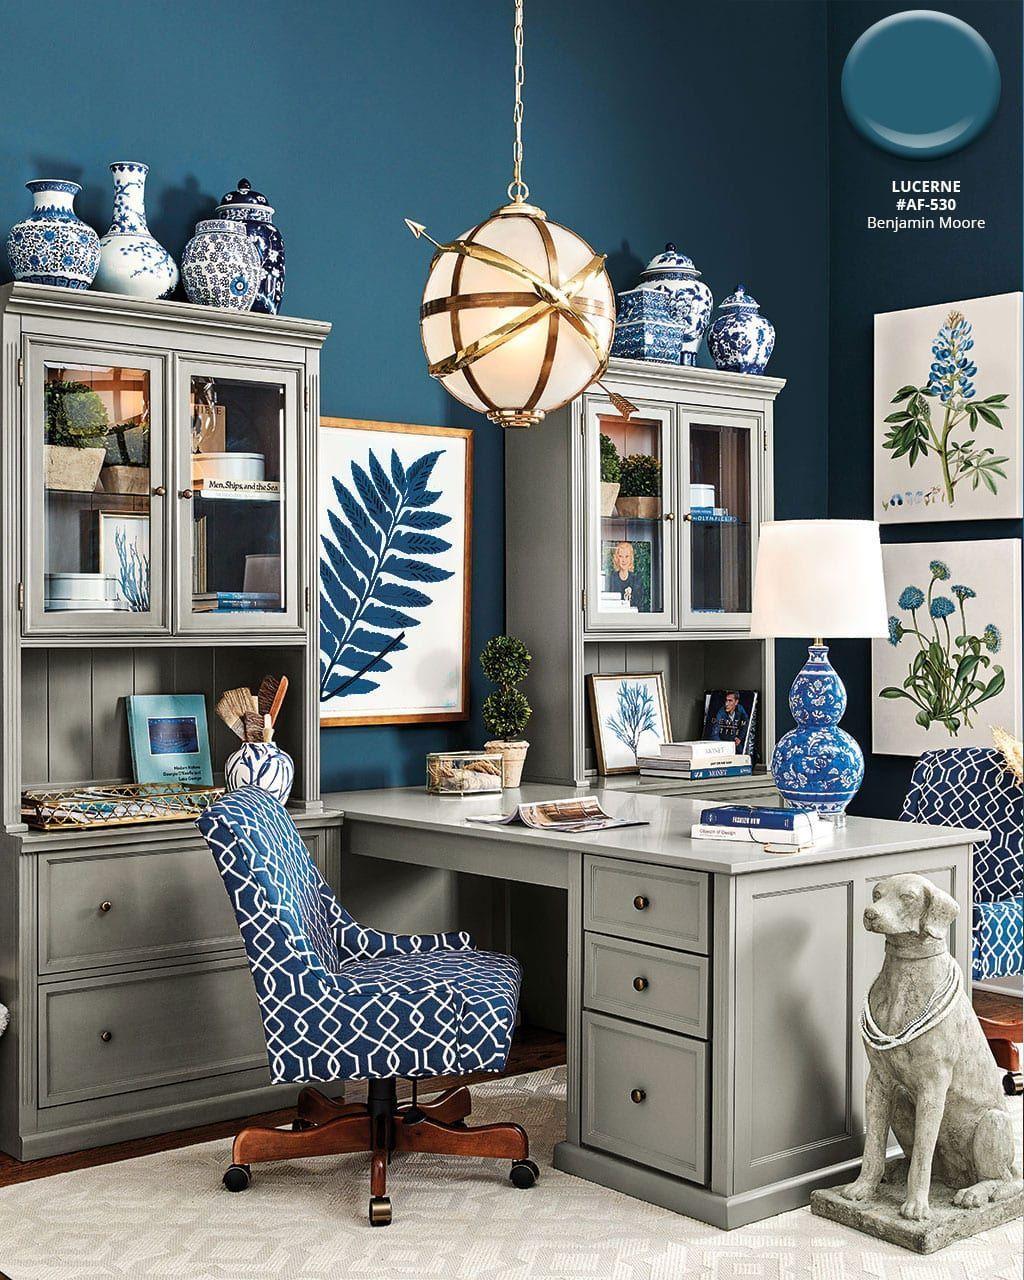 Benjamin Moore S Lucerne Blue Wall Color In Ballard Designs Catalog Ide Kamar Tidur Meja Kantor Kamar Tidur